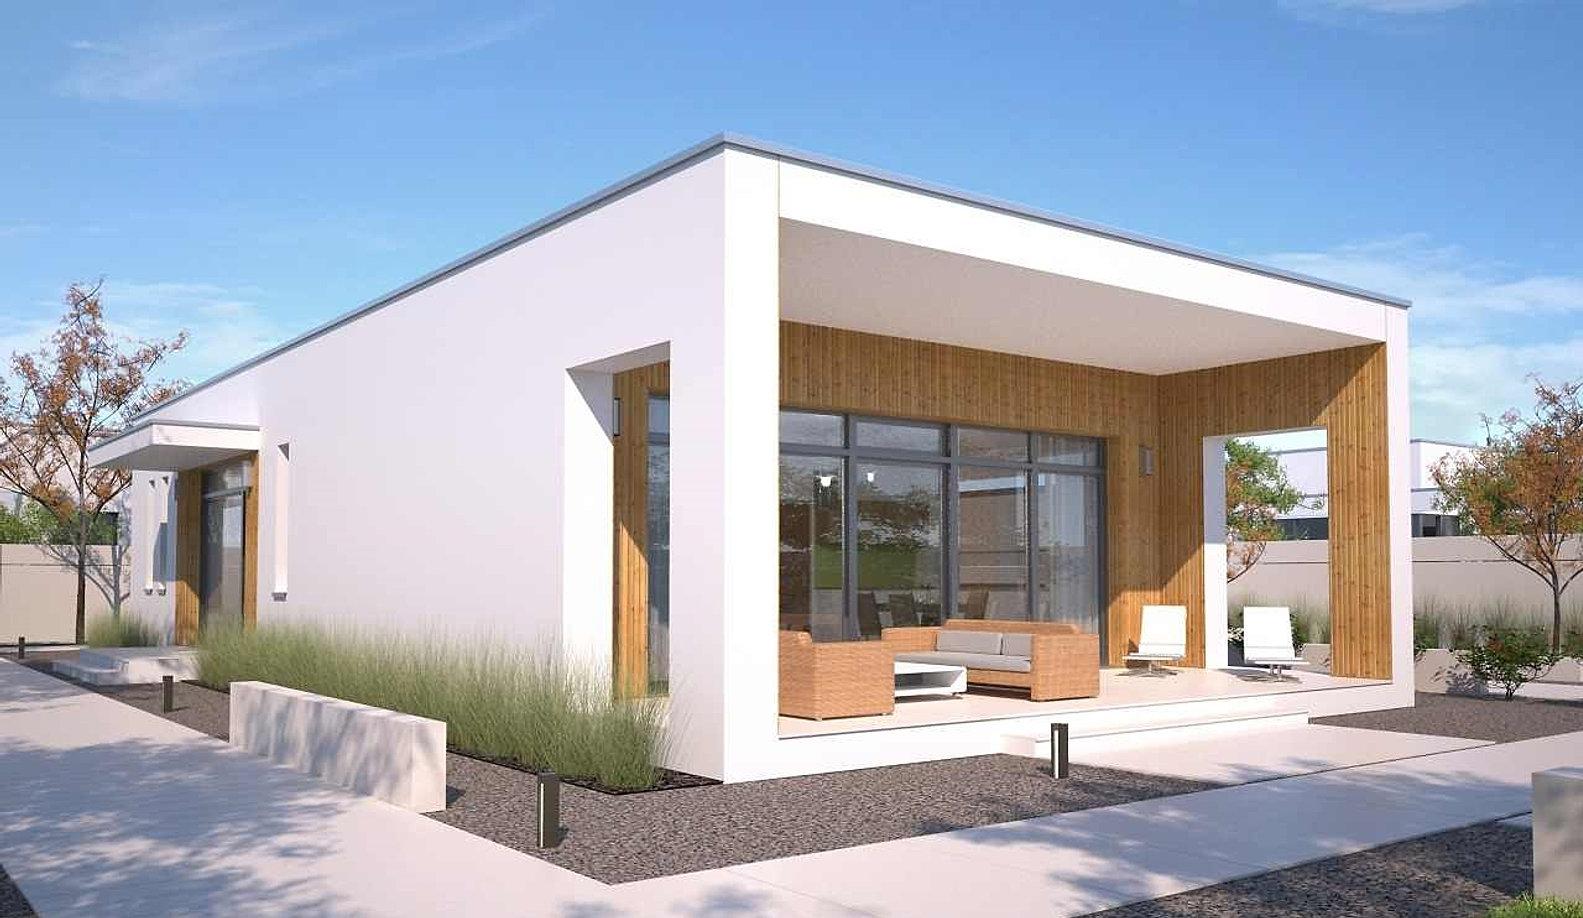 interhaus. Black Bedroom Furniture Sets. Home Design Ideas